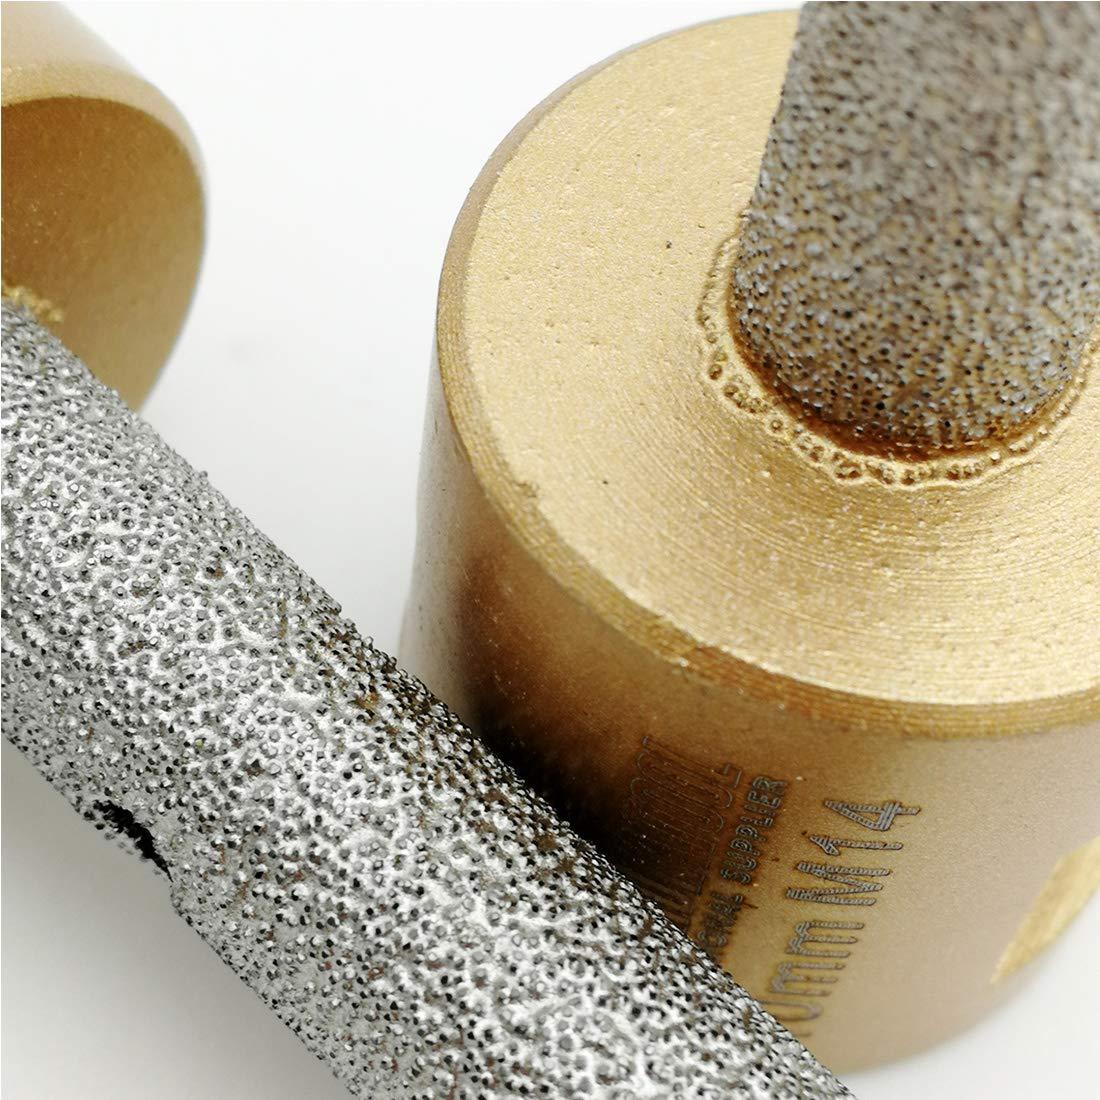 DIATOOL 2pcs Diamond Finger Bit Milling bit M14 Thread Vacuum Brazed Enlarging and Shaping Round Bevel Existing Holes in Porcelain Hard Ceramic Marble Granite Diameter 20mm